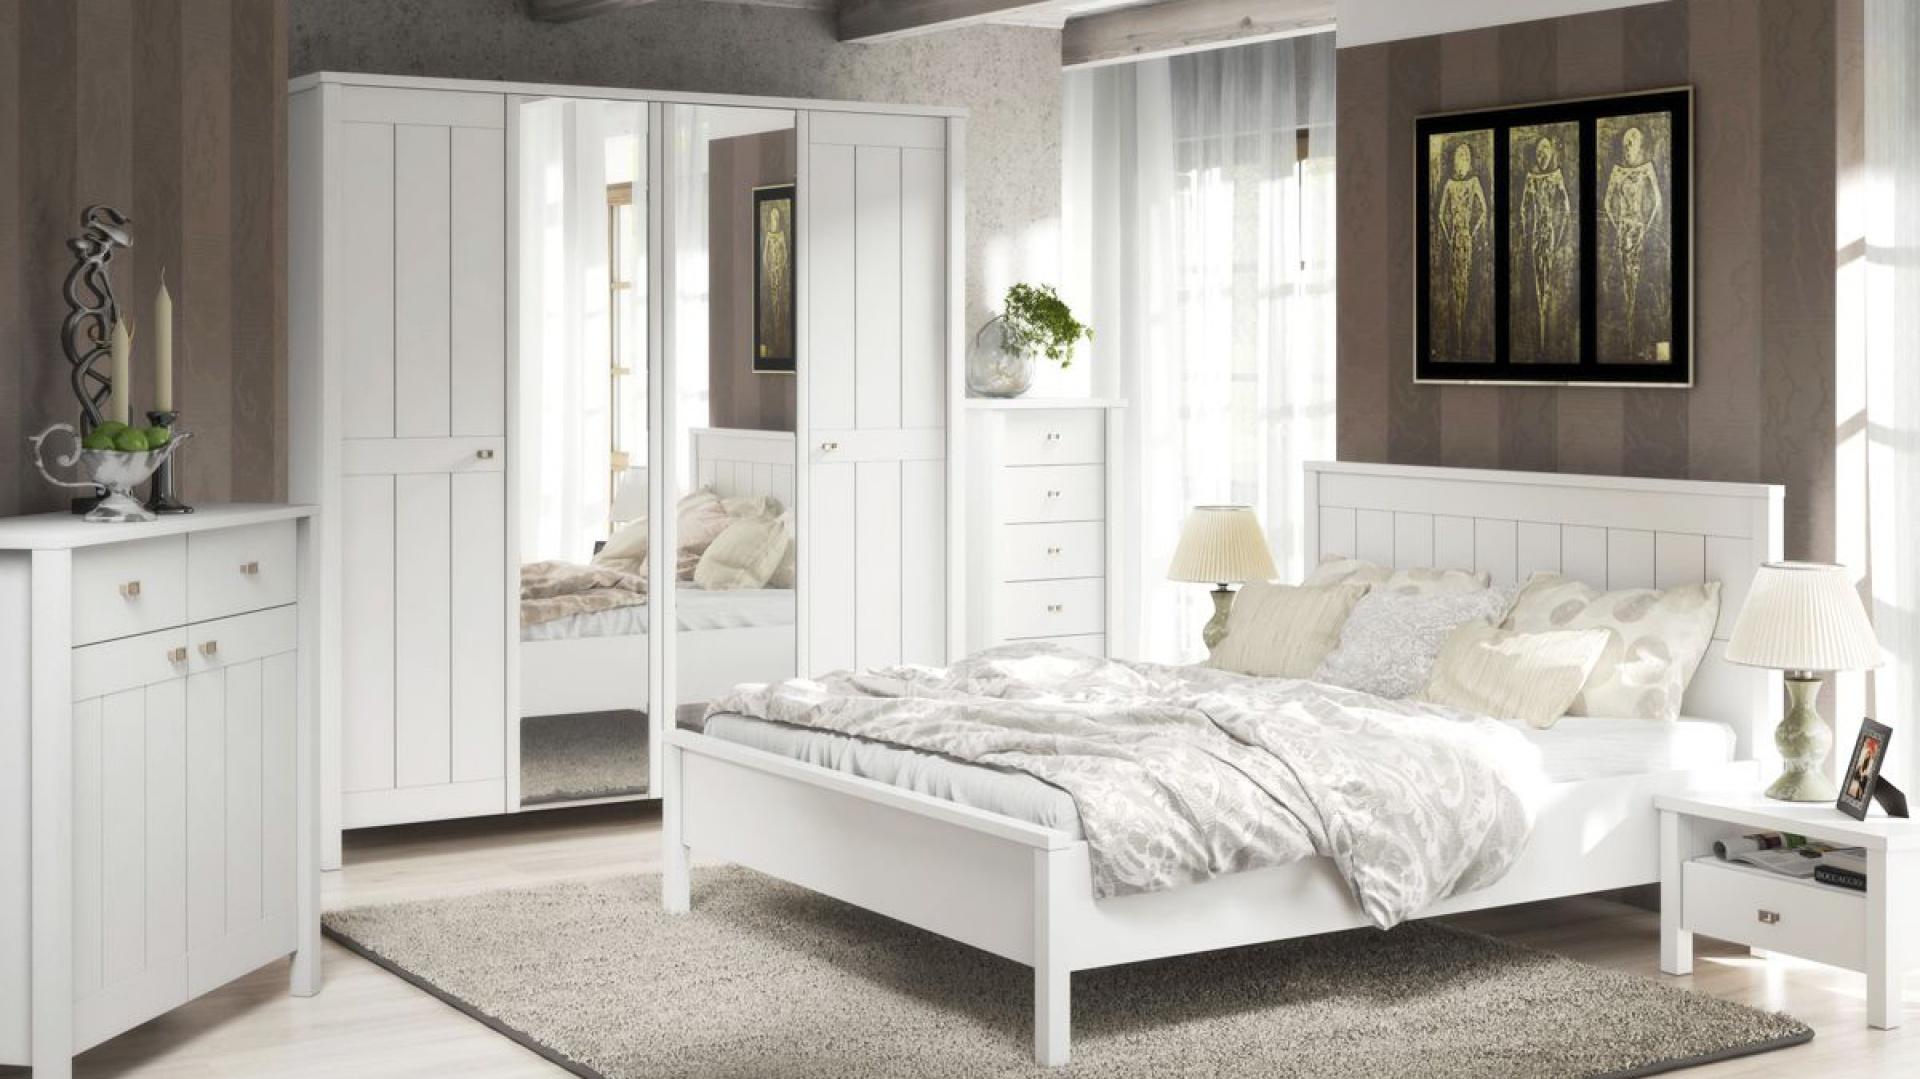 Sypialnia biale meble